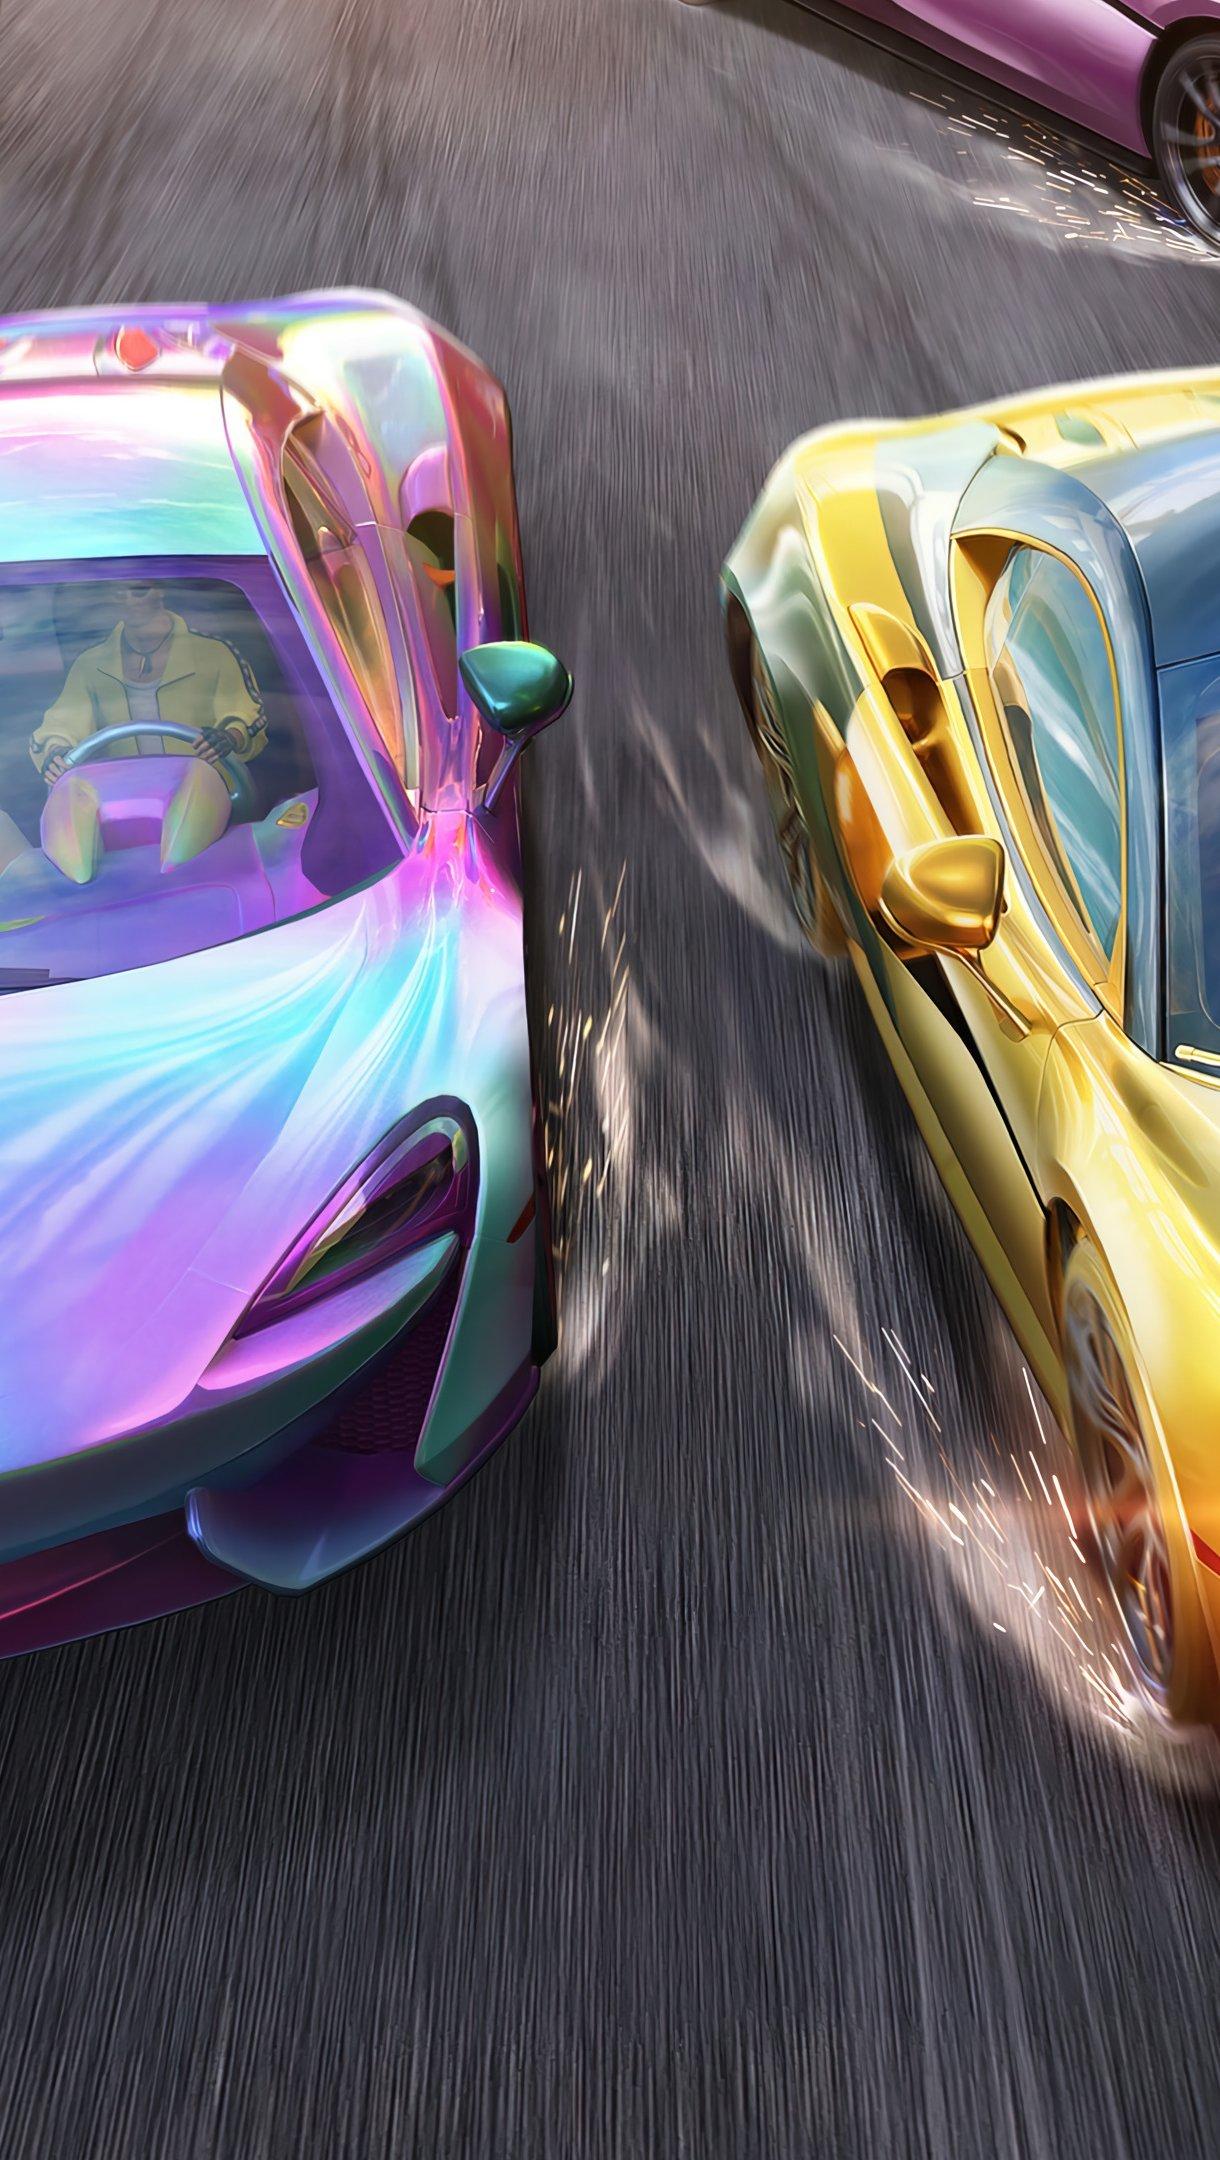 Pubg Mobile Mclaren Sports Car Wallpaper 4k Ultra Hd Id 8084